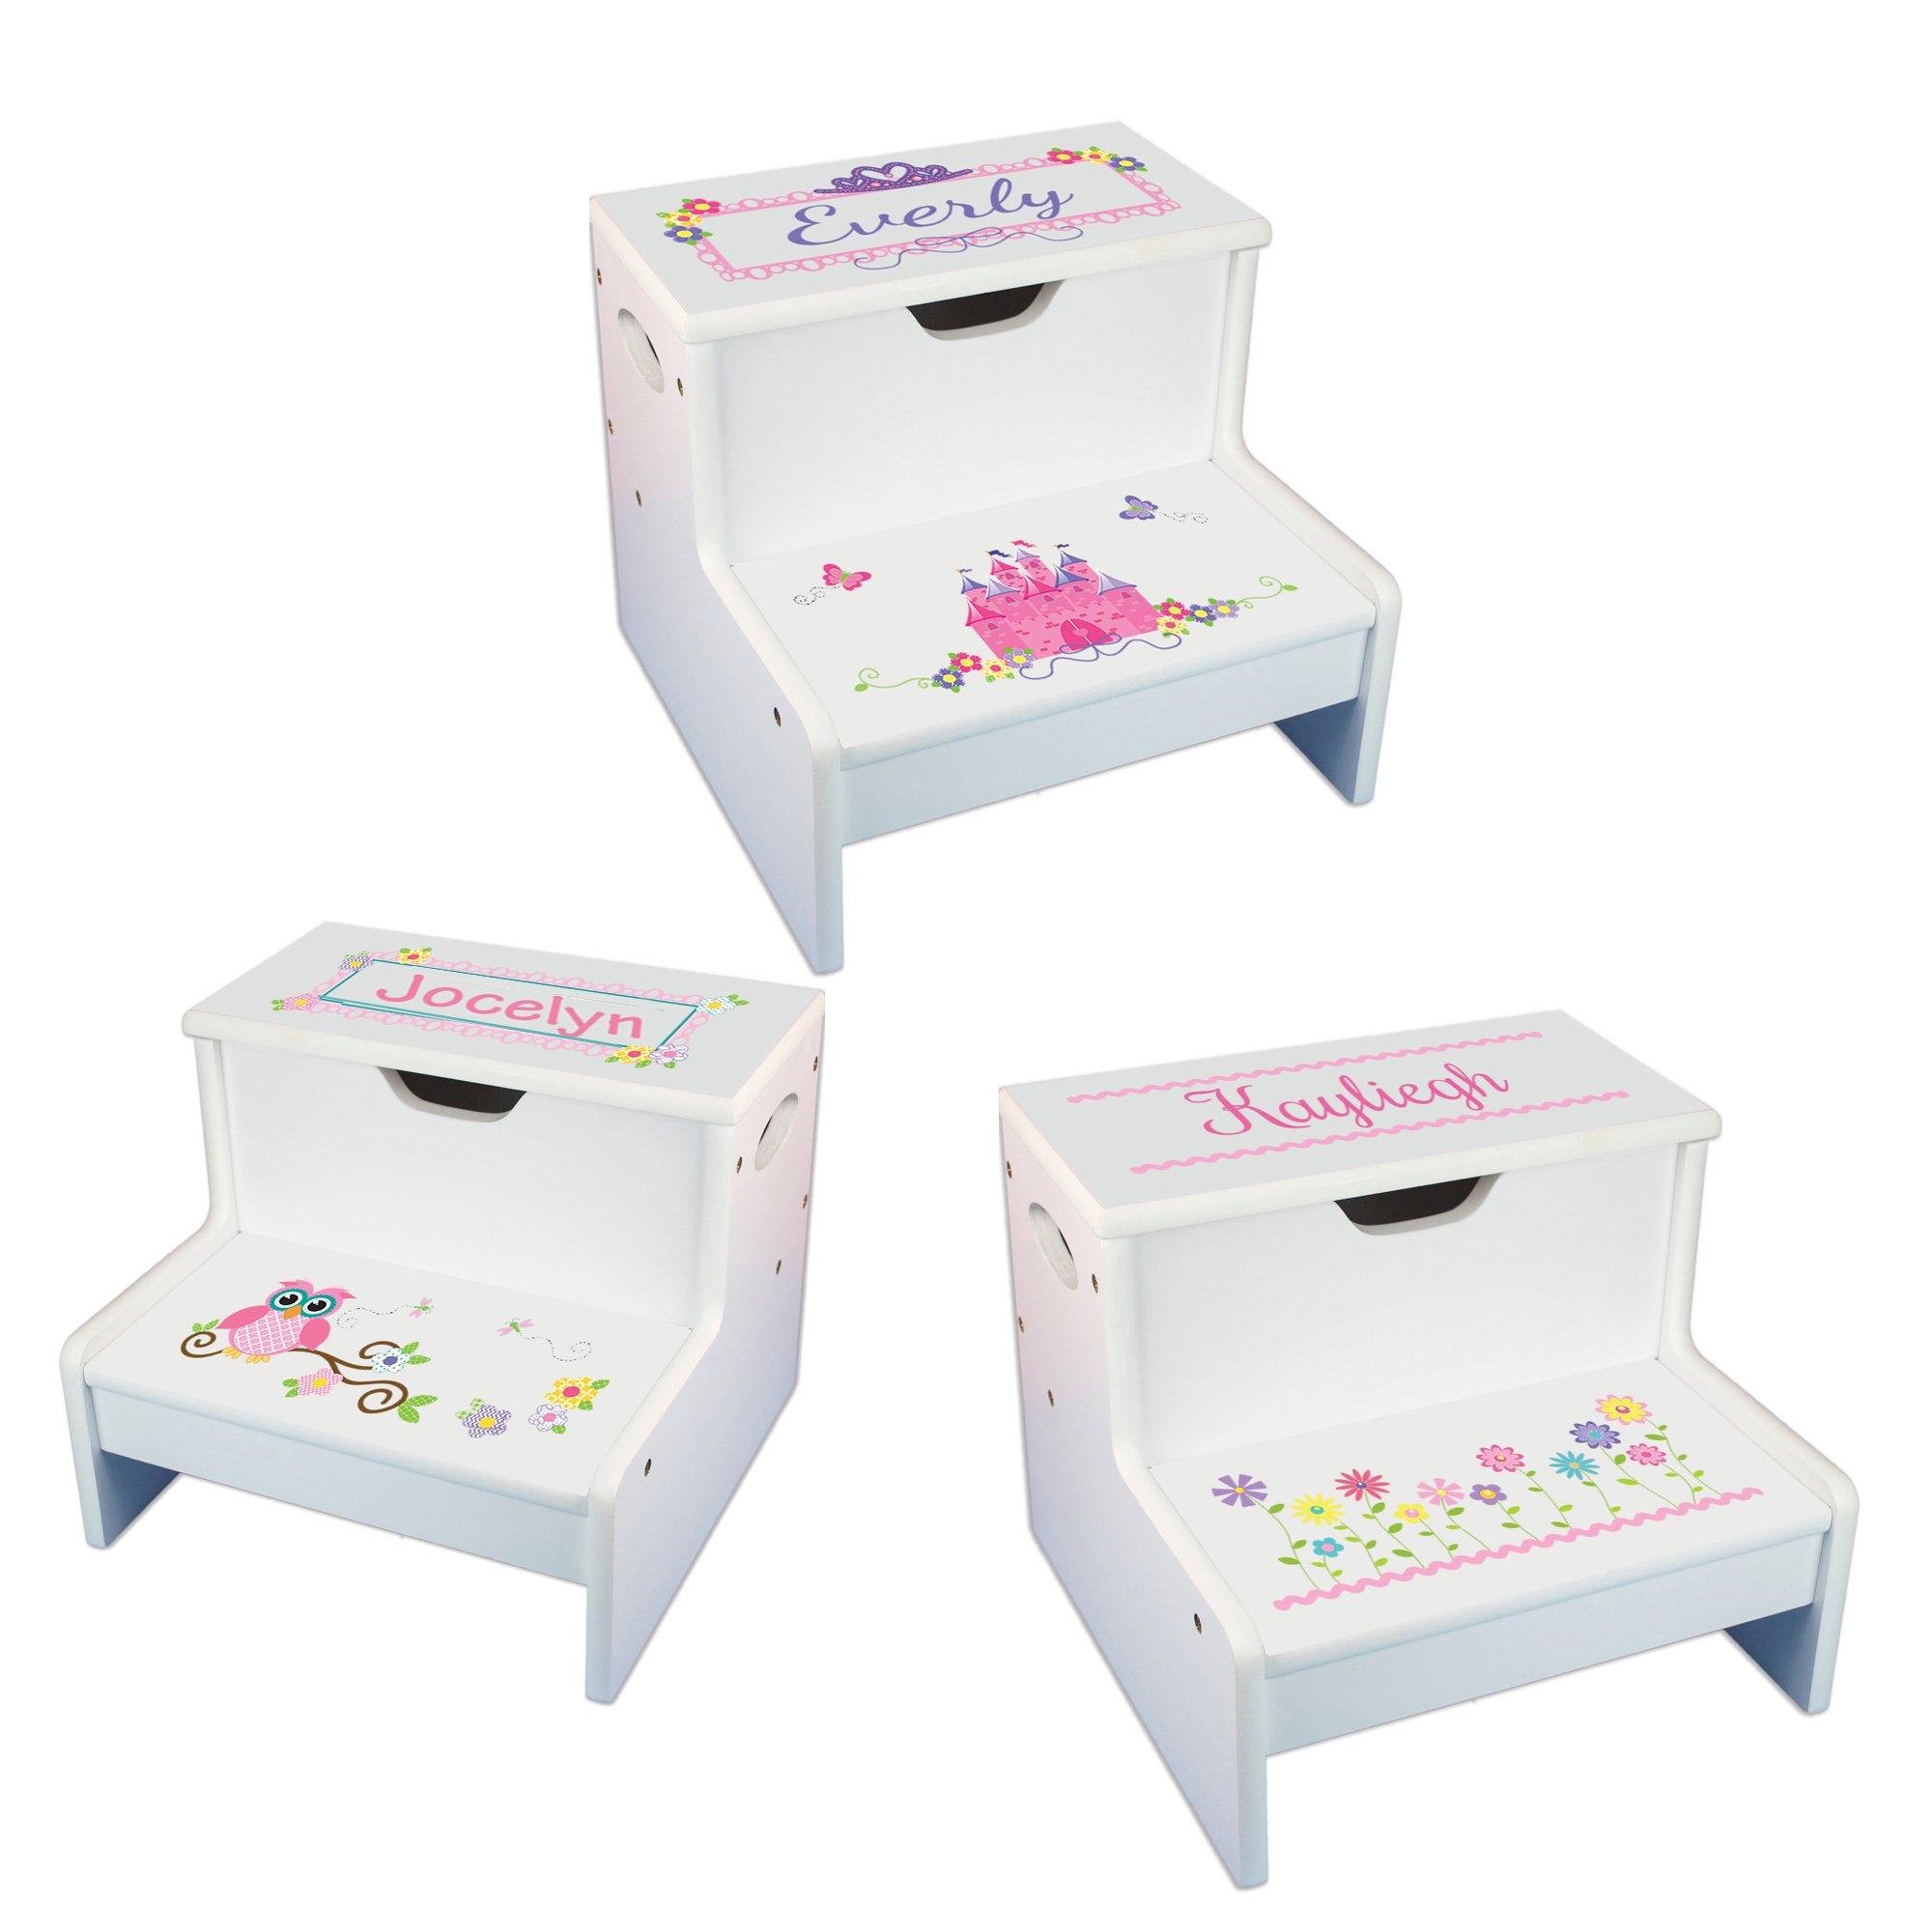 Girls Personalized Step Stool with Storage by MyBambino